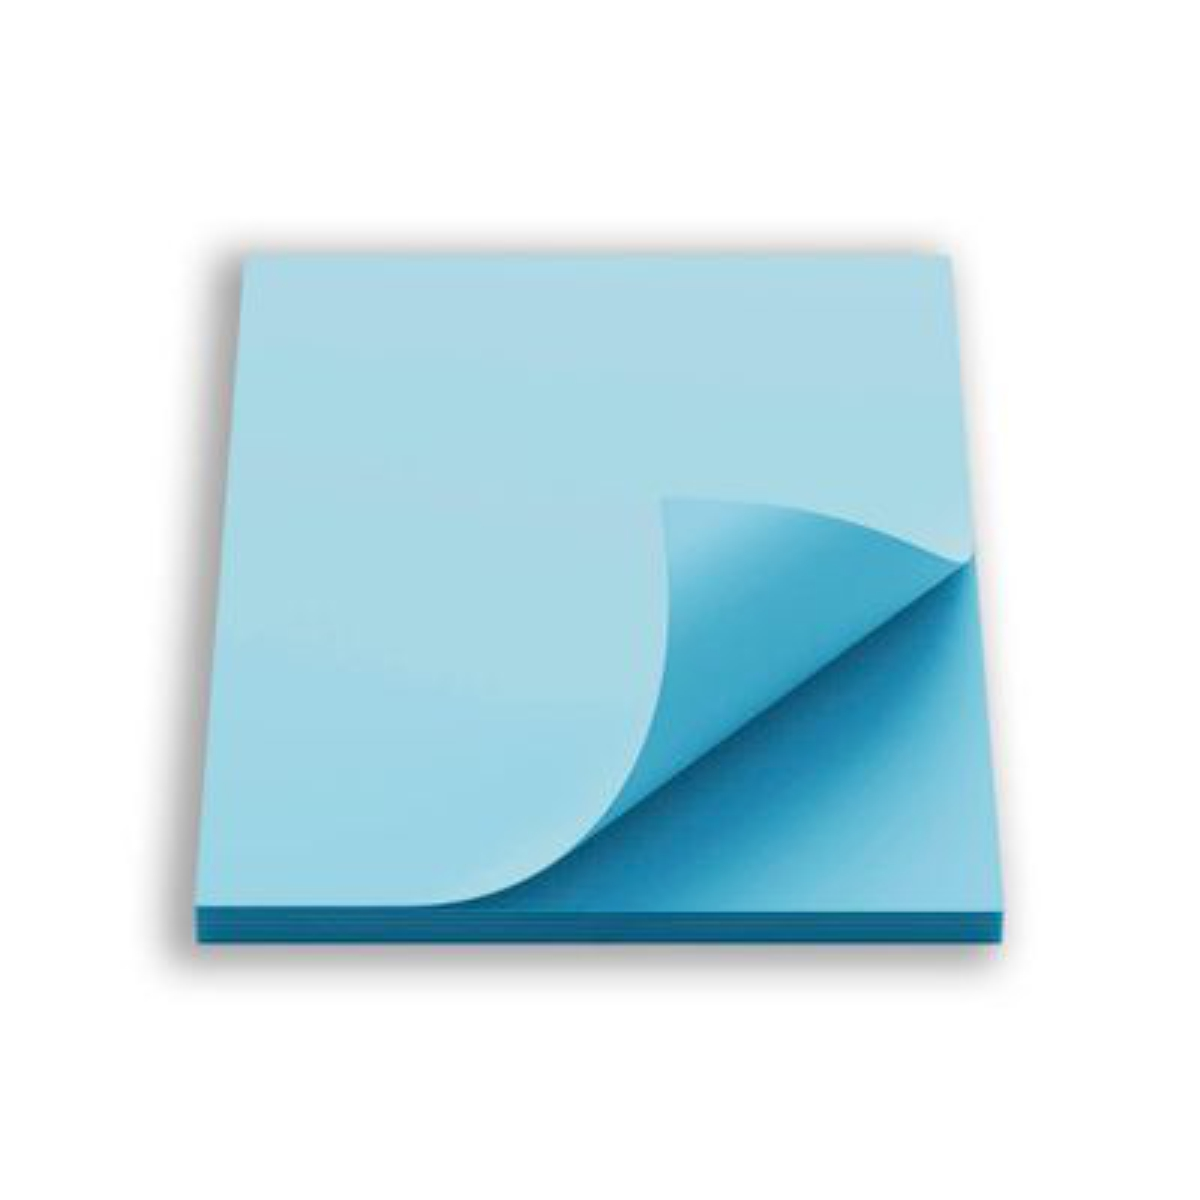 Bloco Notas Adesivas Keep Azul 75x75mm C/100 Folhas